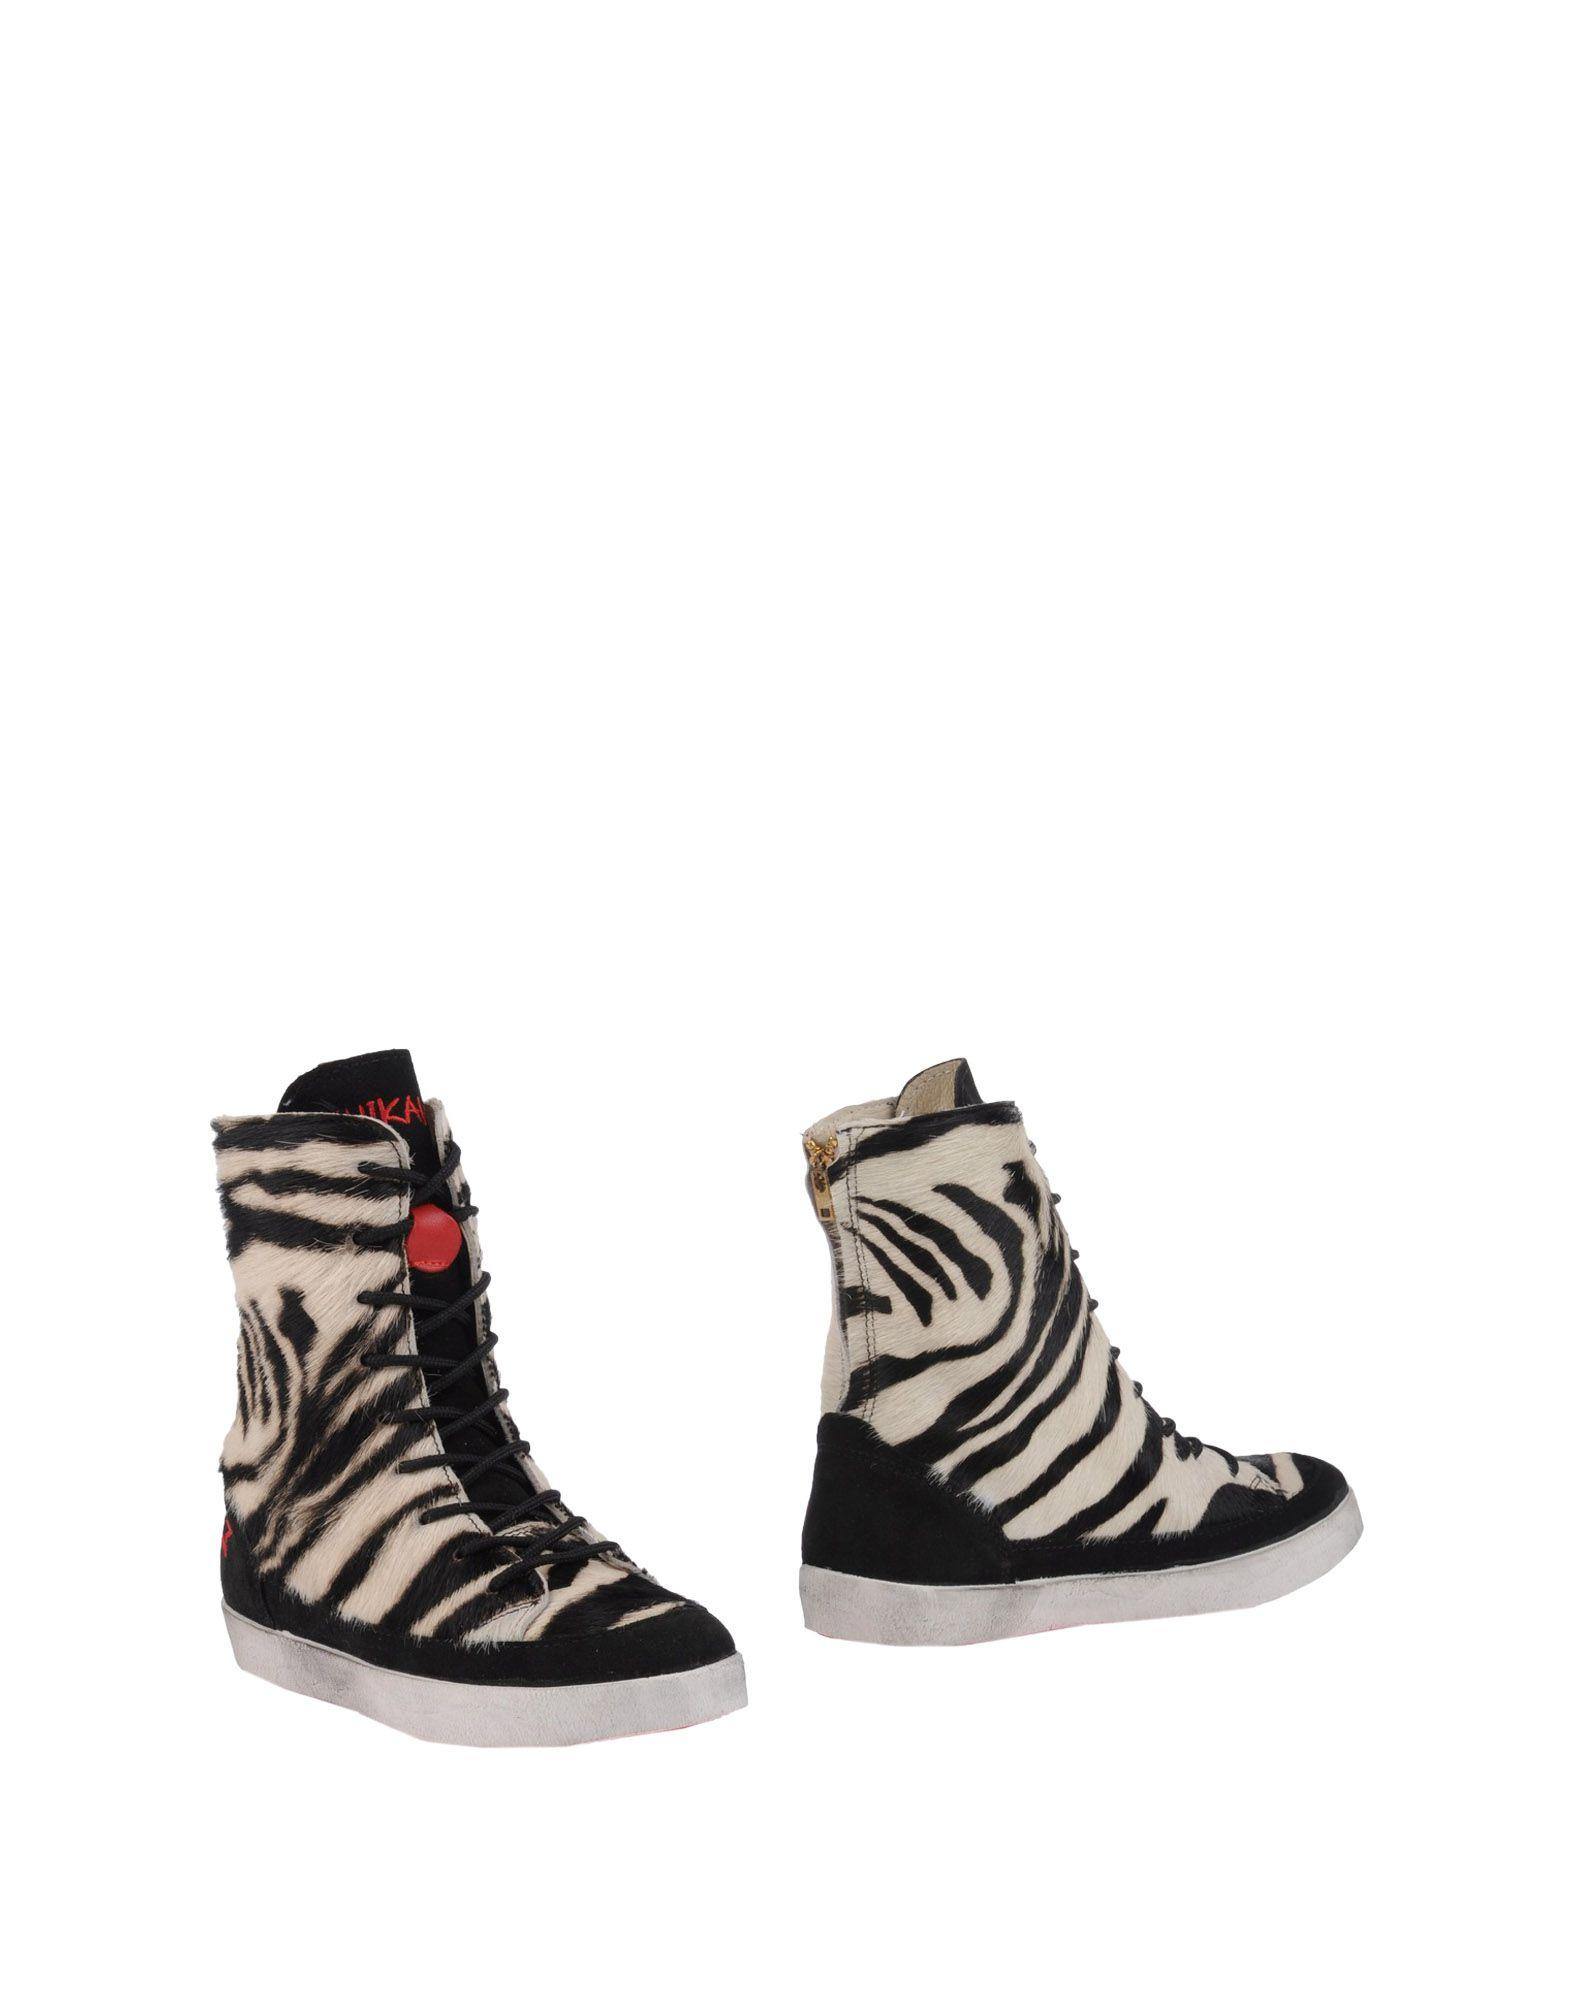 Ishikawa Ankle Ankle Ankle Boot - Women Ishikawa Ankle Boots online on  United Kingdom - 11235192DD c5563b